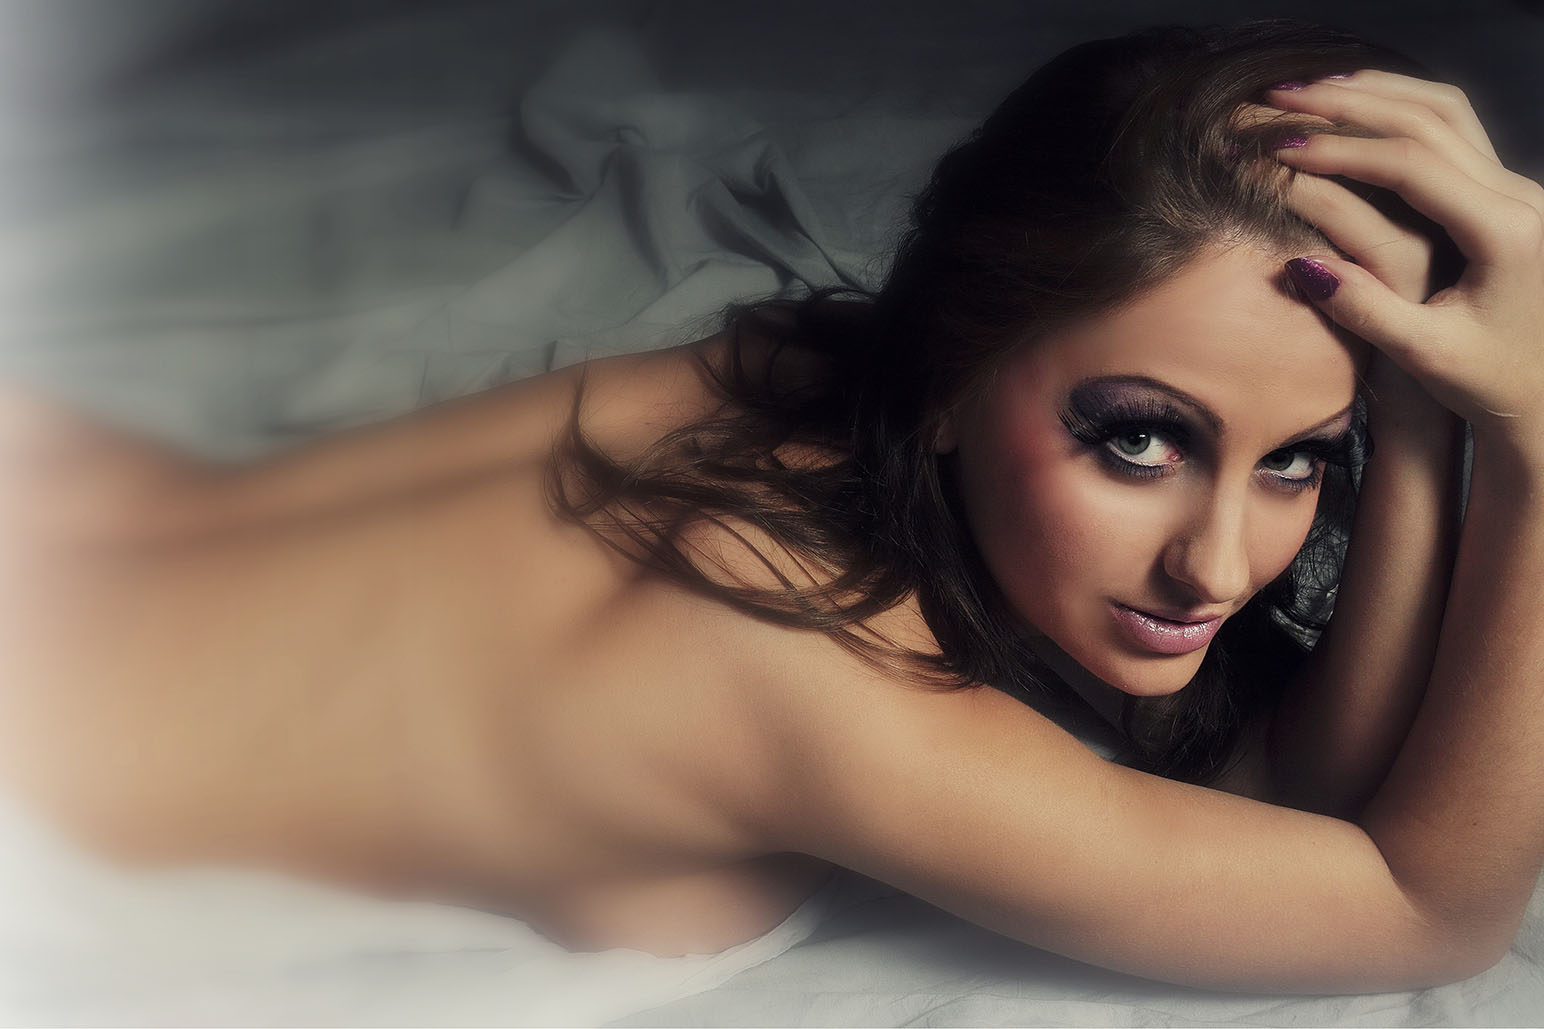 boudoir-photography-editing-example